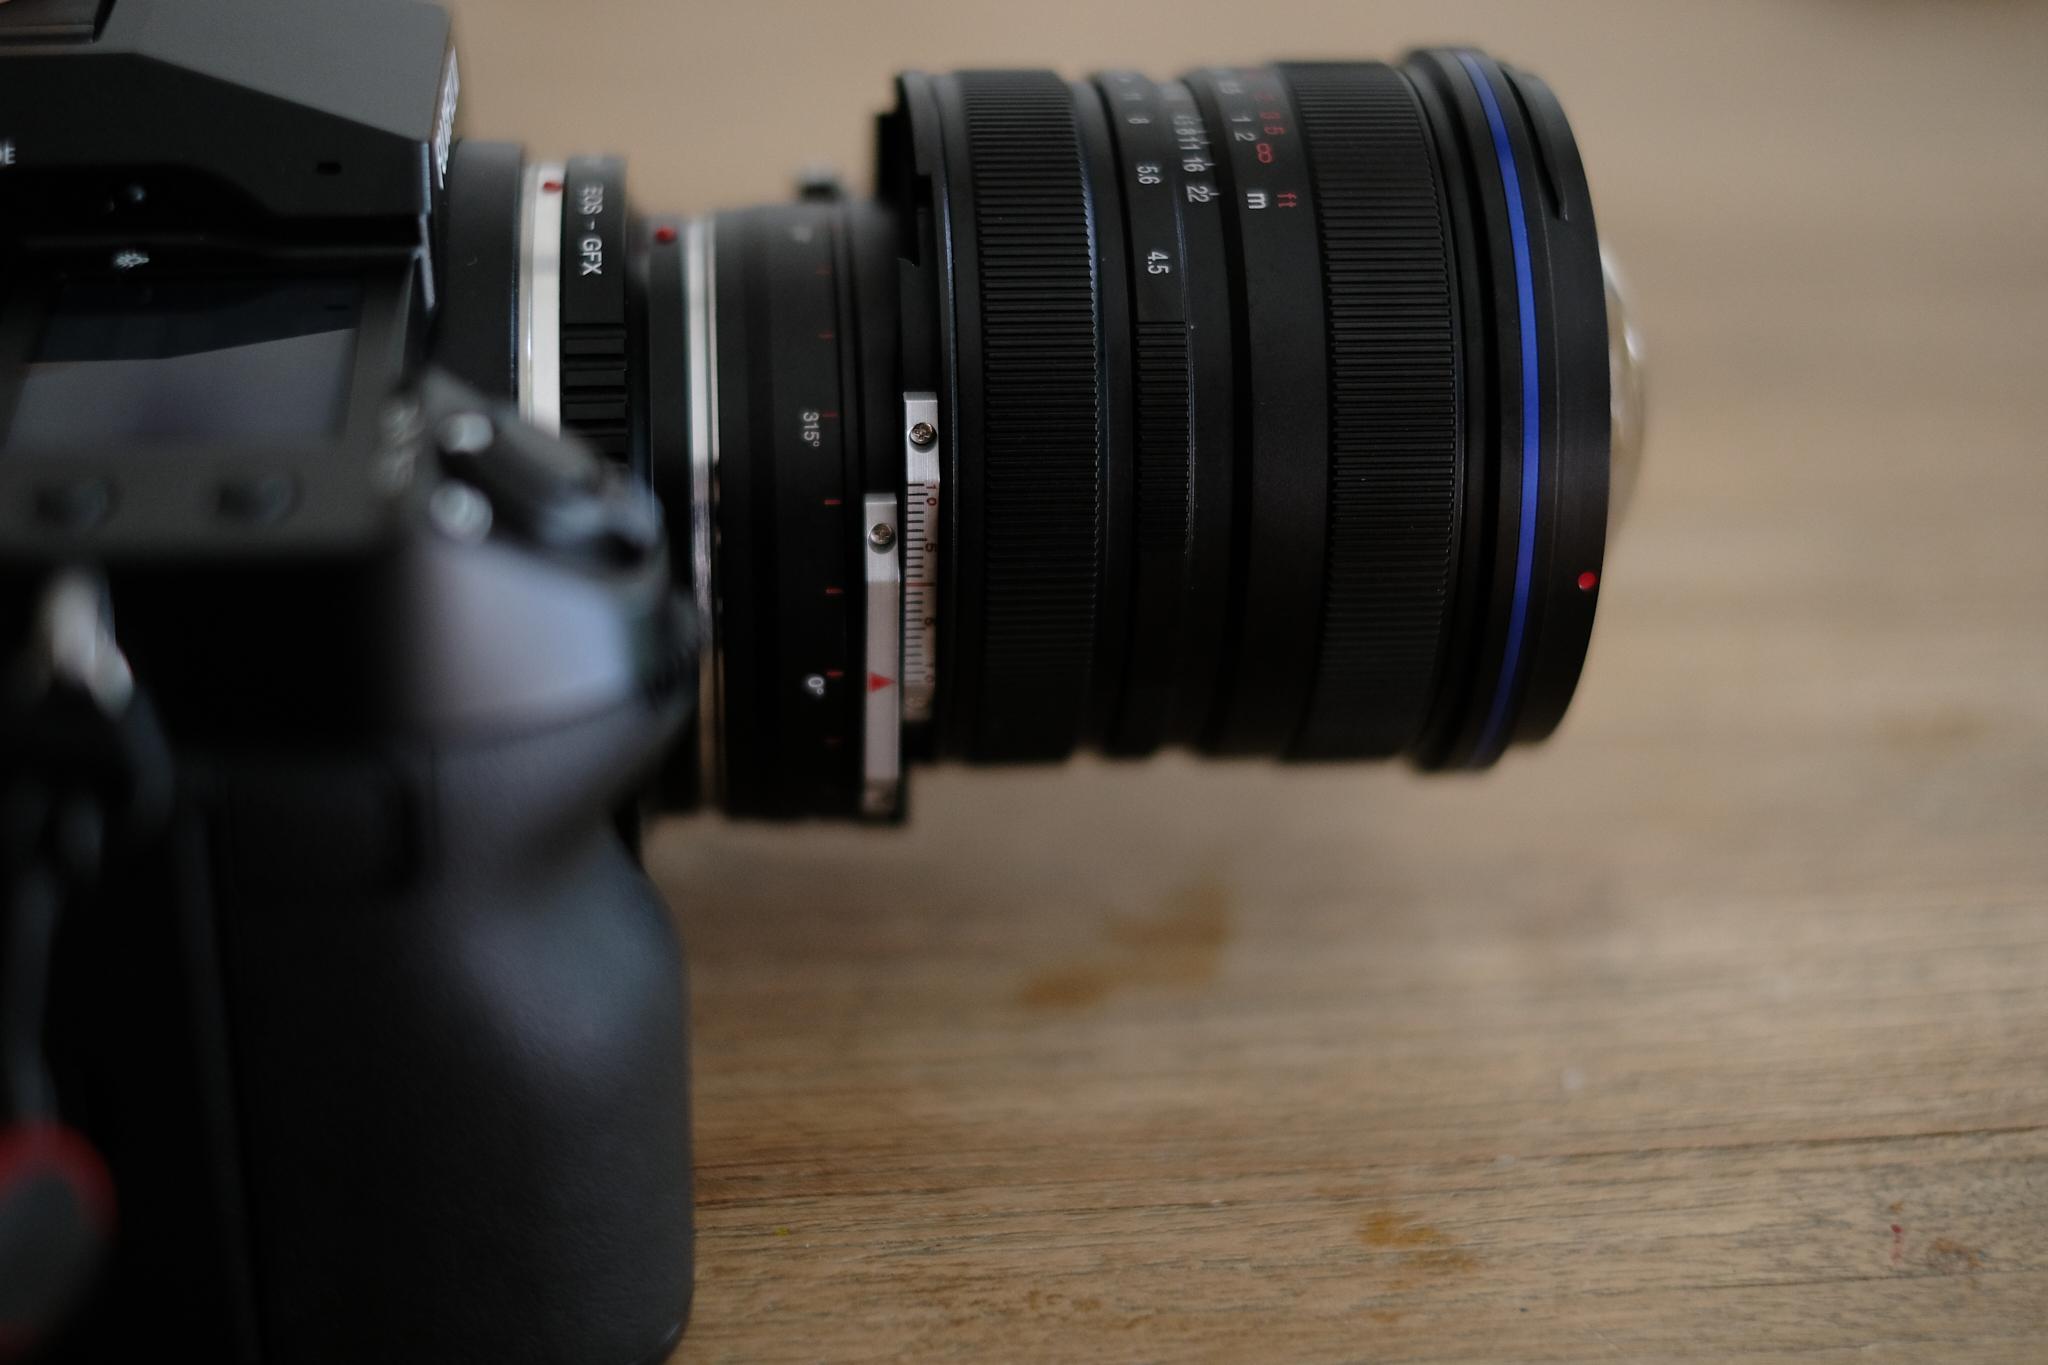 Shift Happens! GFX100S with Laowa 15mm Shift lens